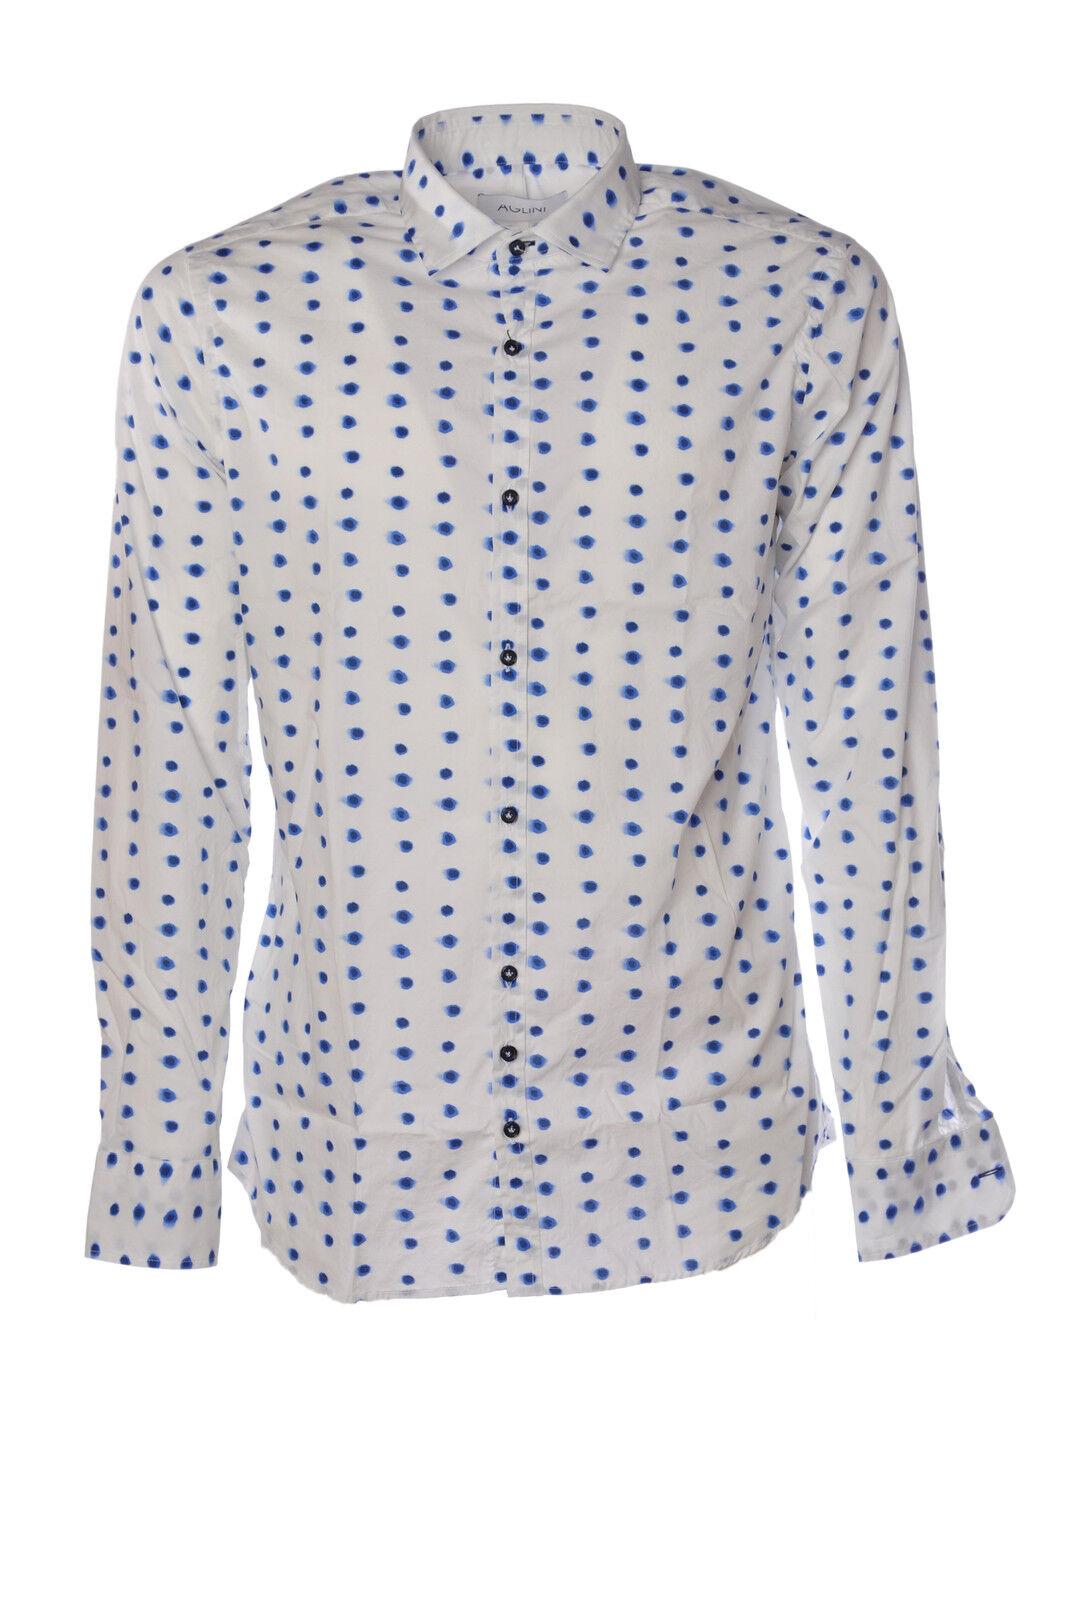 Aglini  -  Shirt - Male - 42 - Weiß - 1458115B164428